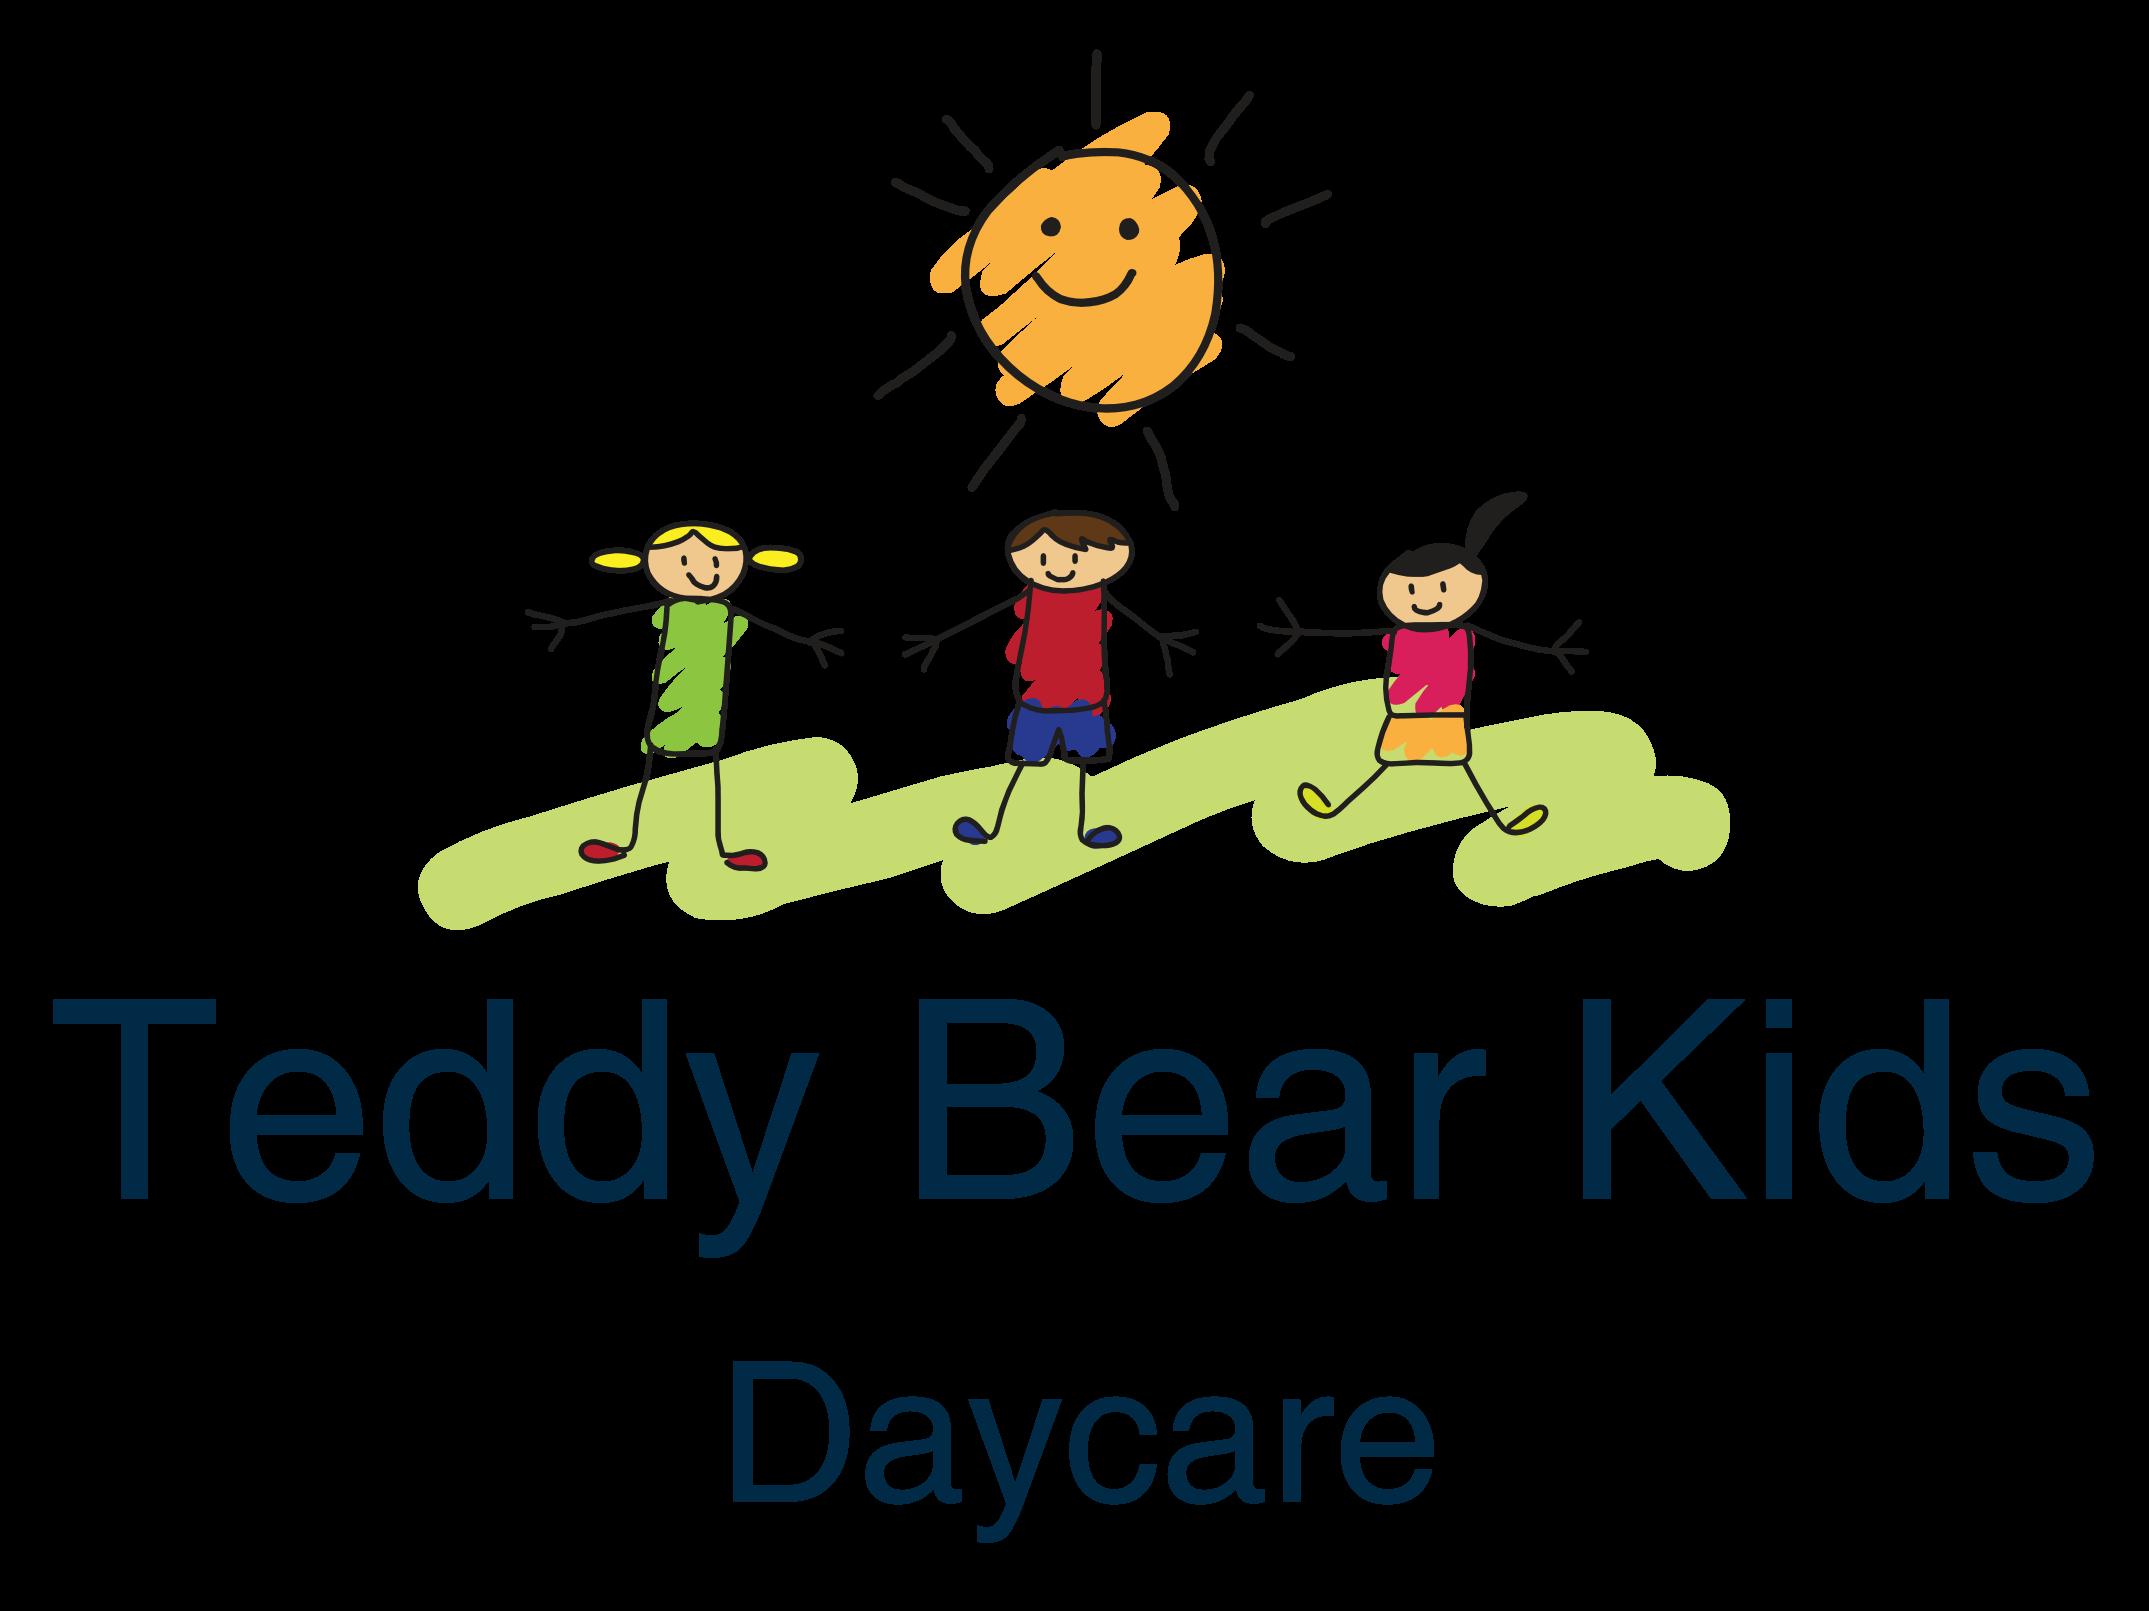 Teddy Bear Kids Daycare